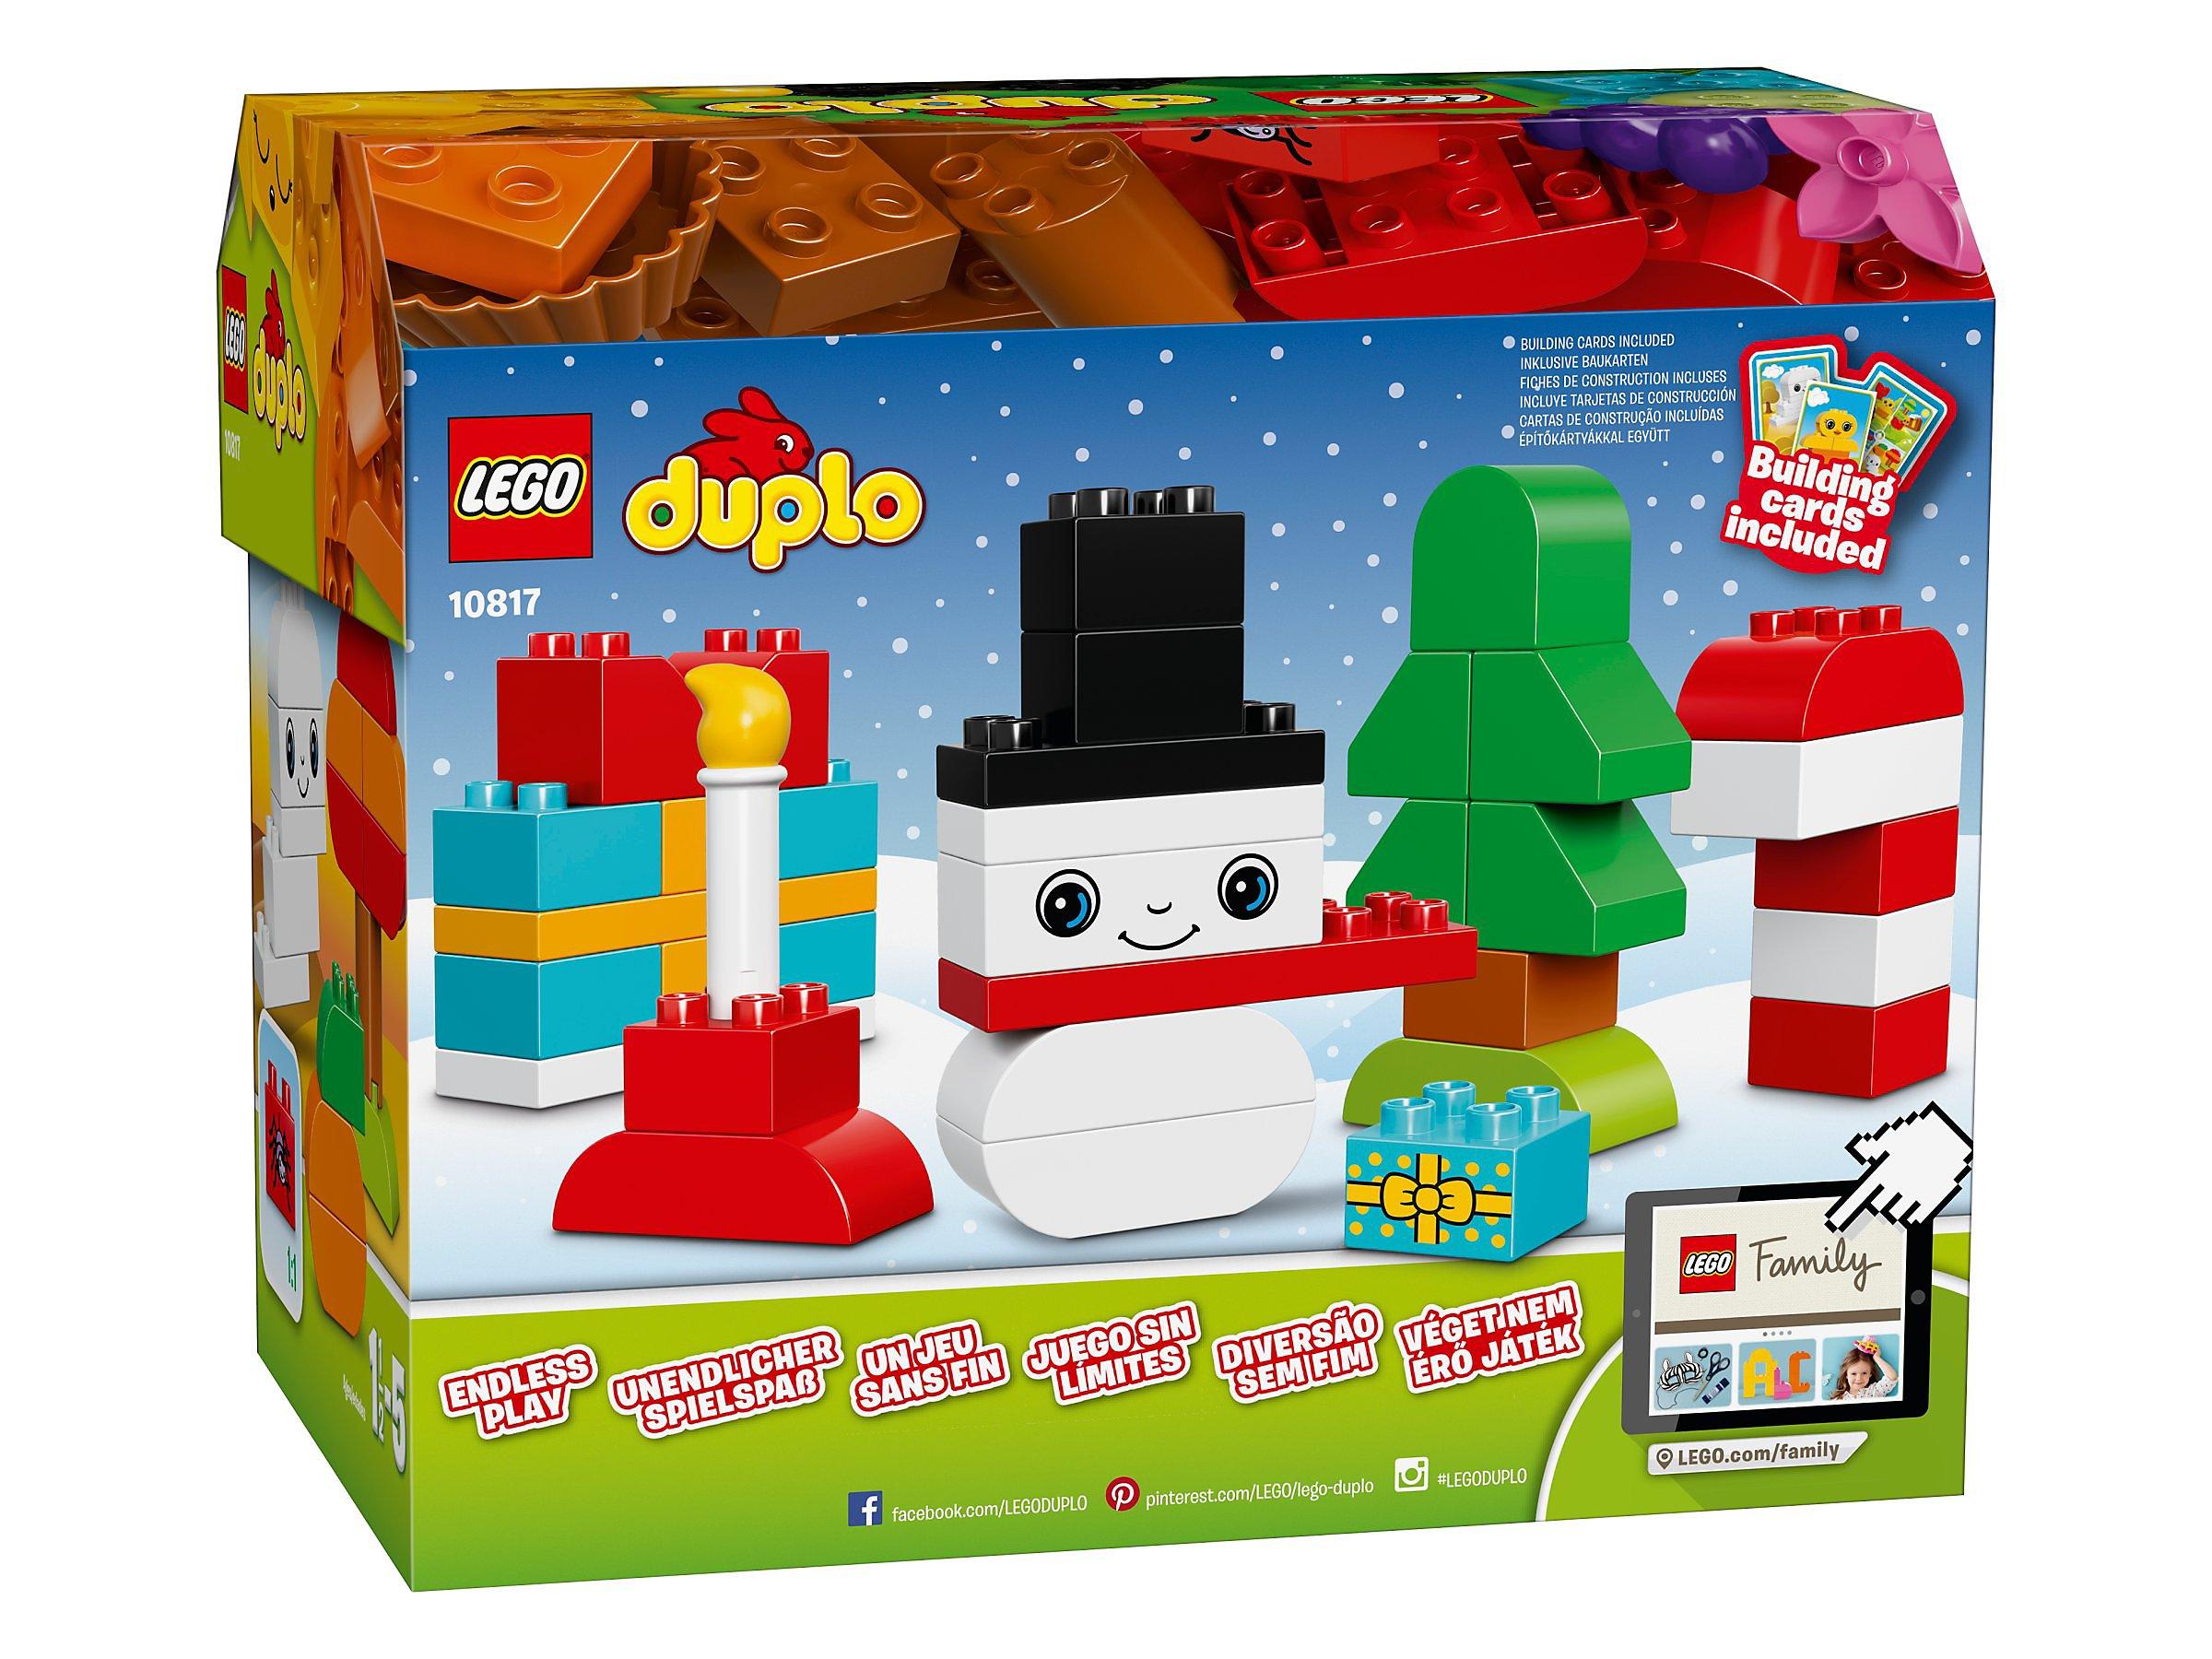 Lego Bauset